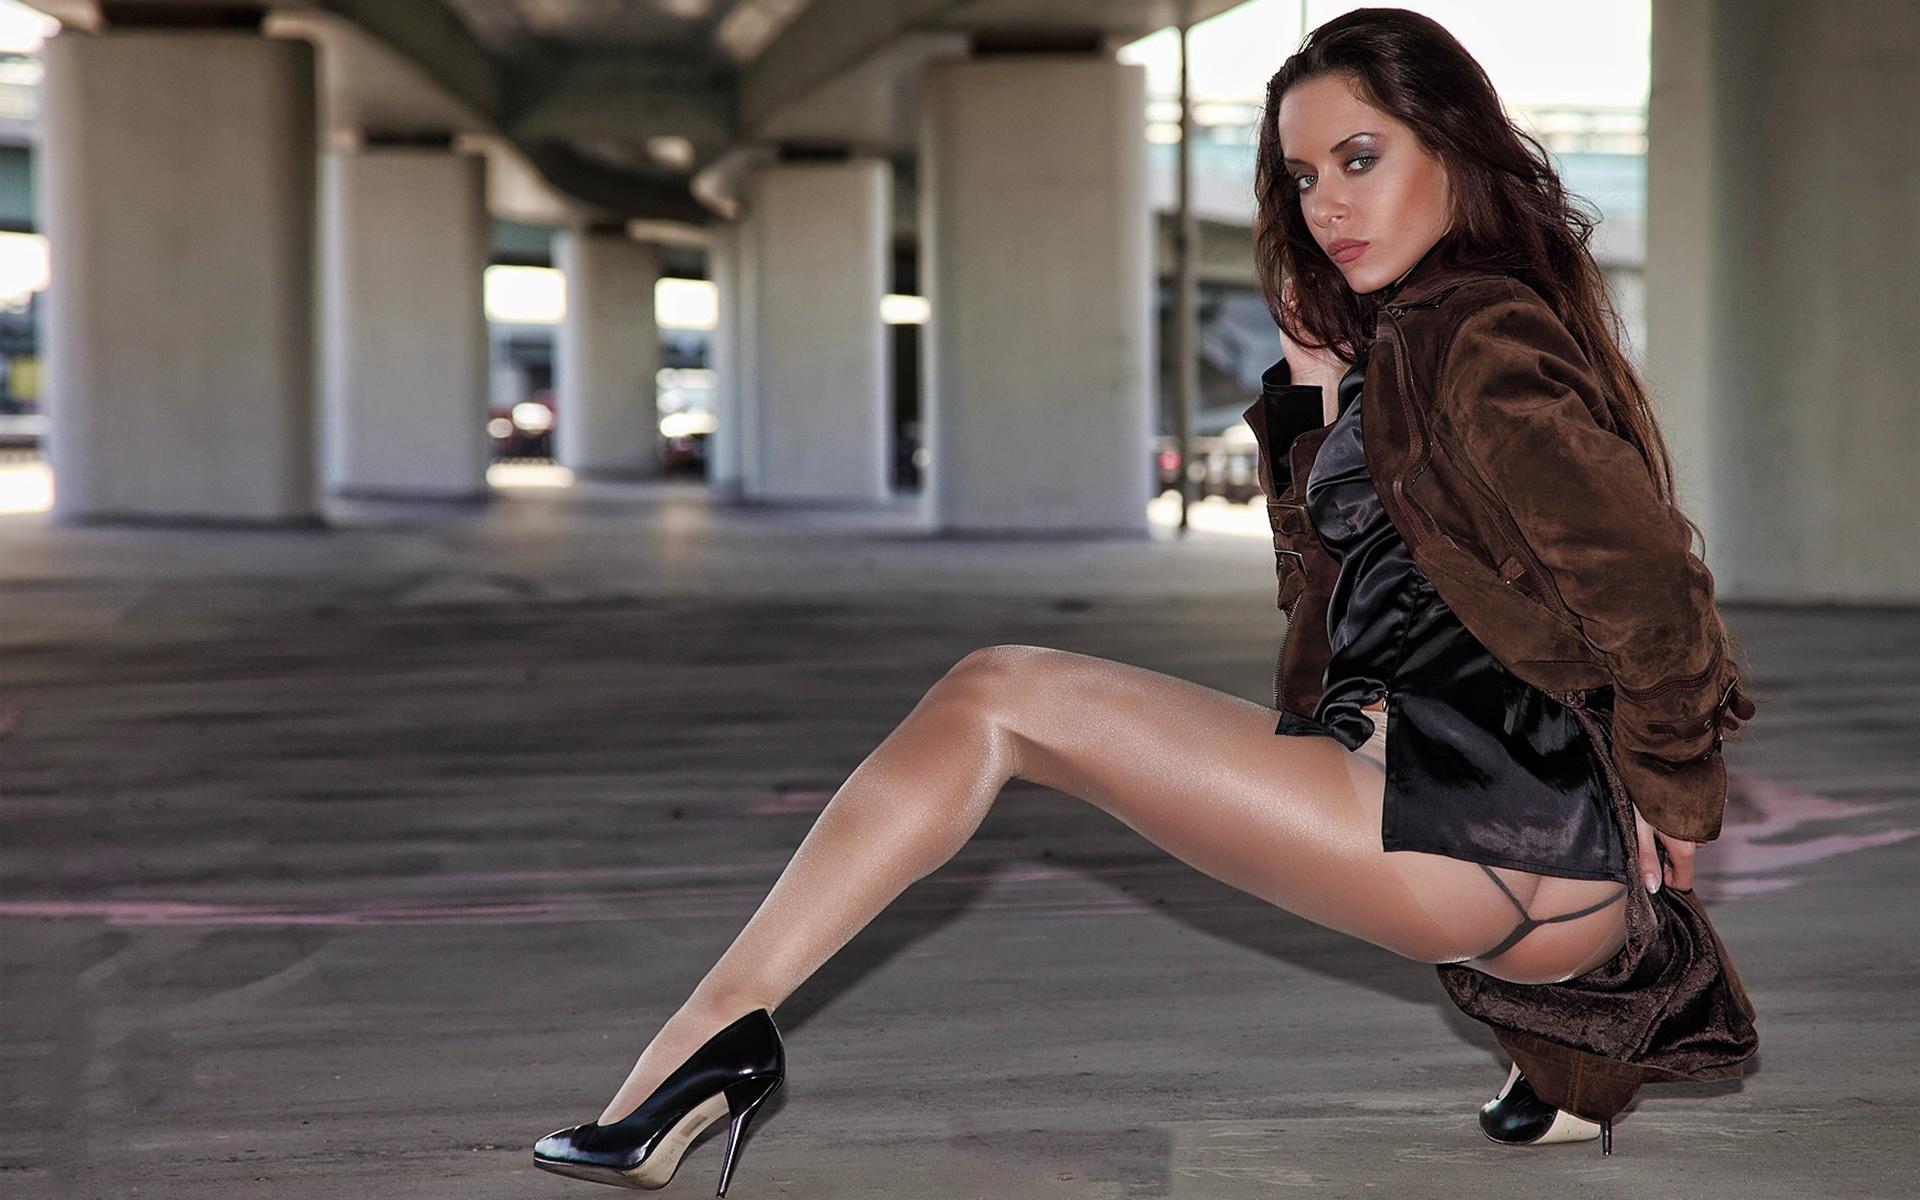 Hot Legs In Stockings Free Pics 82